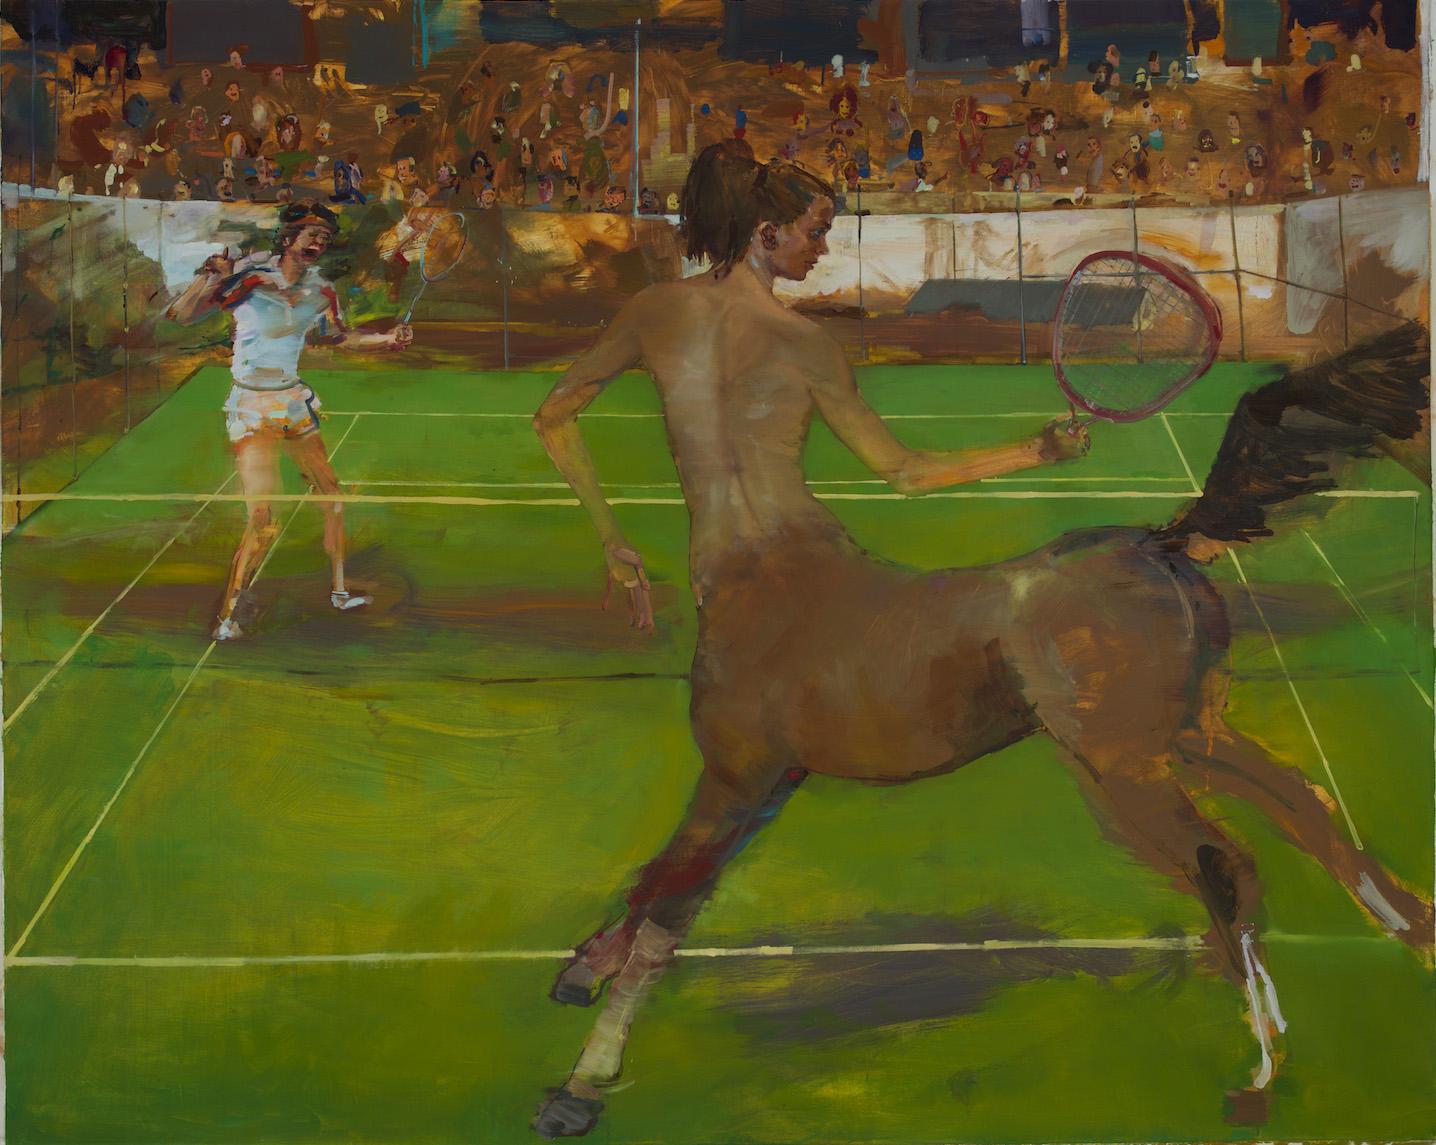 Bethany Fancer Winning at Tennis